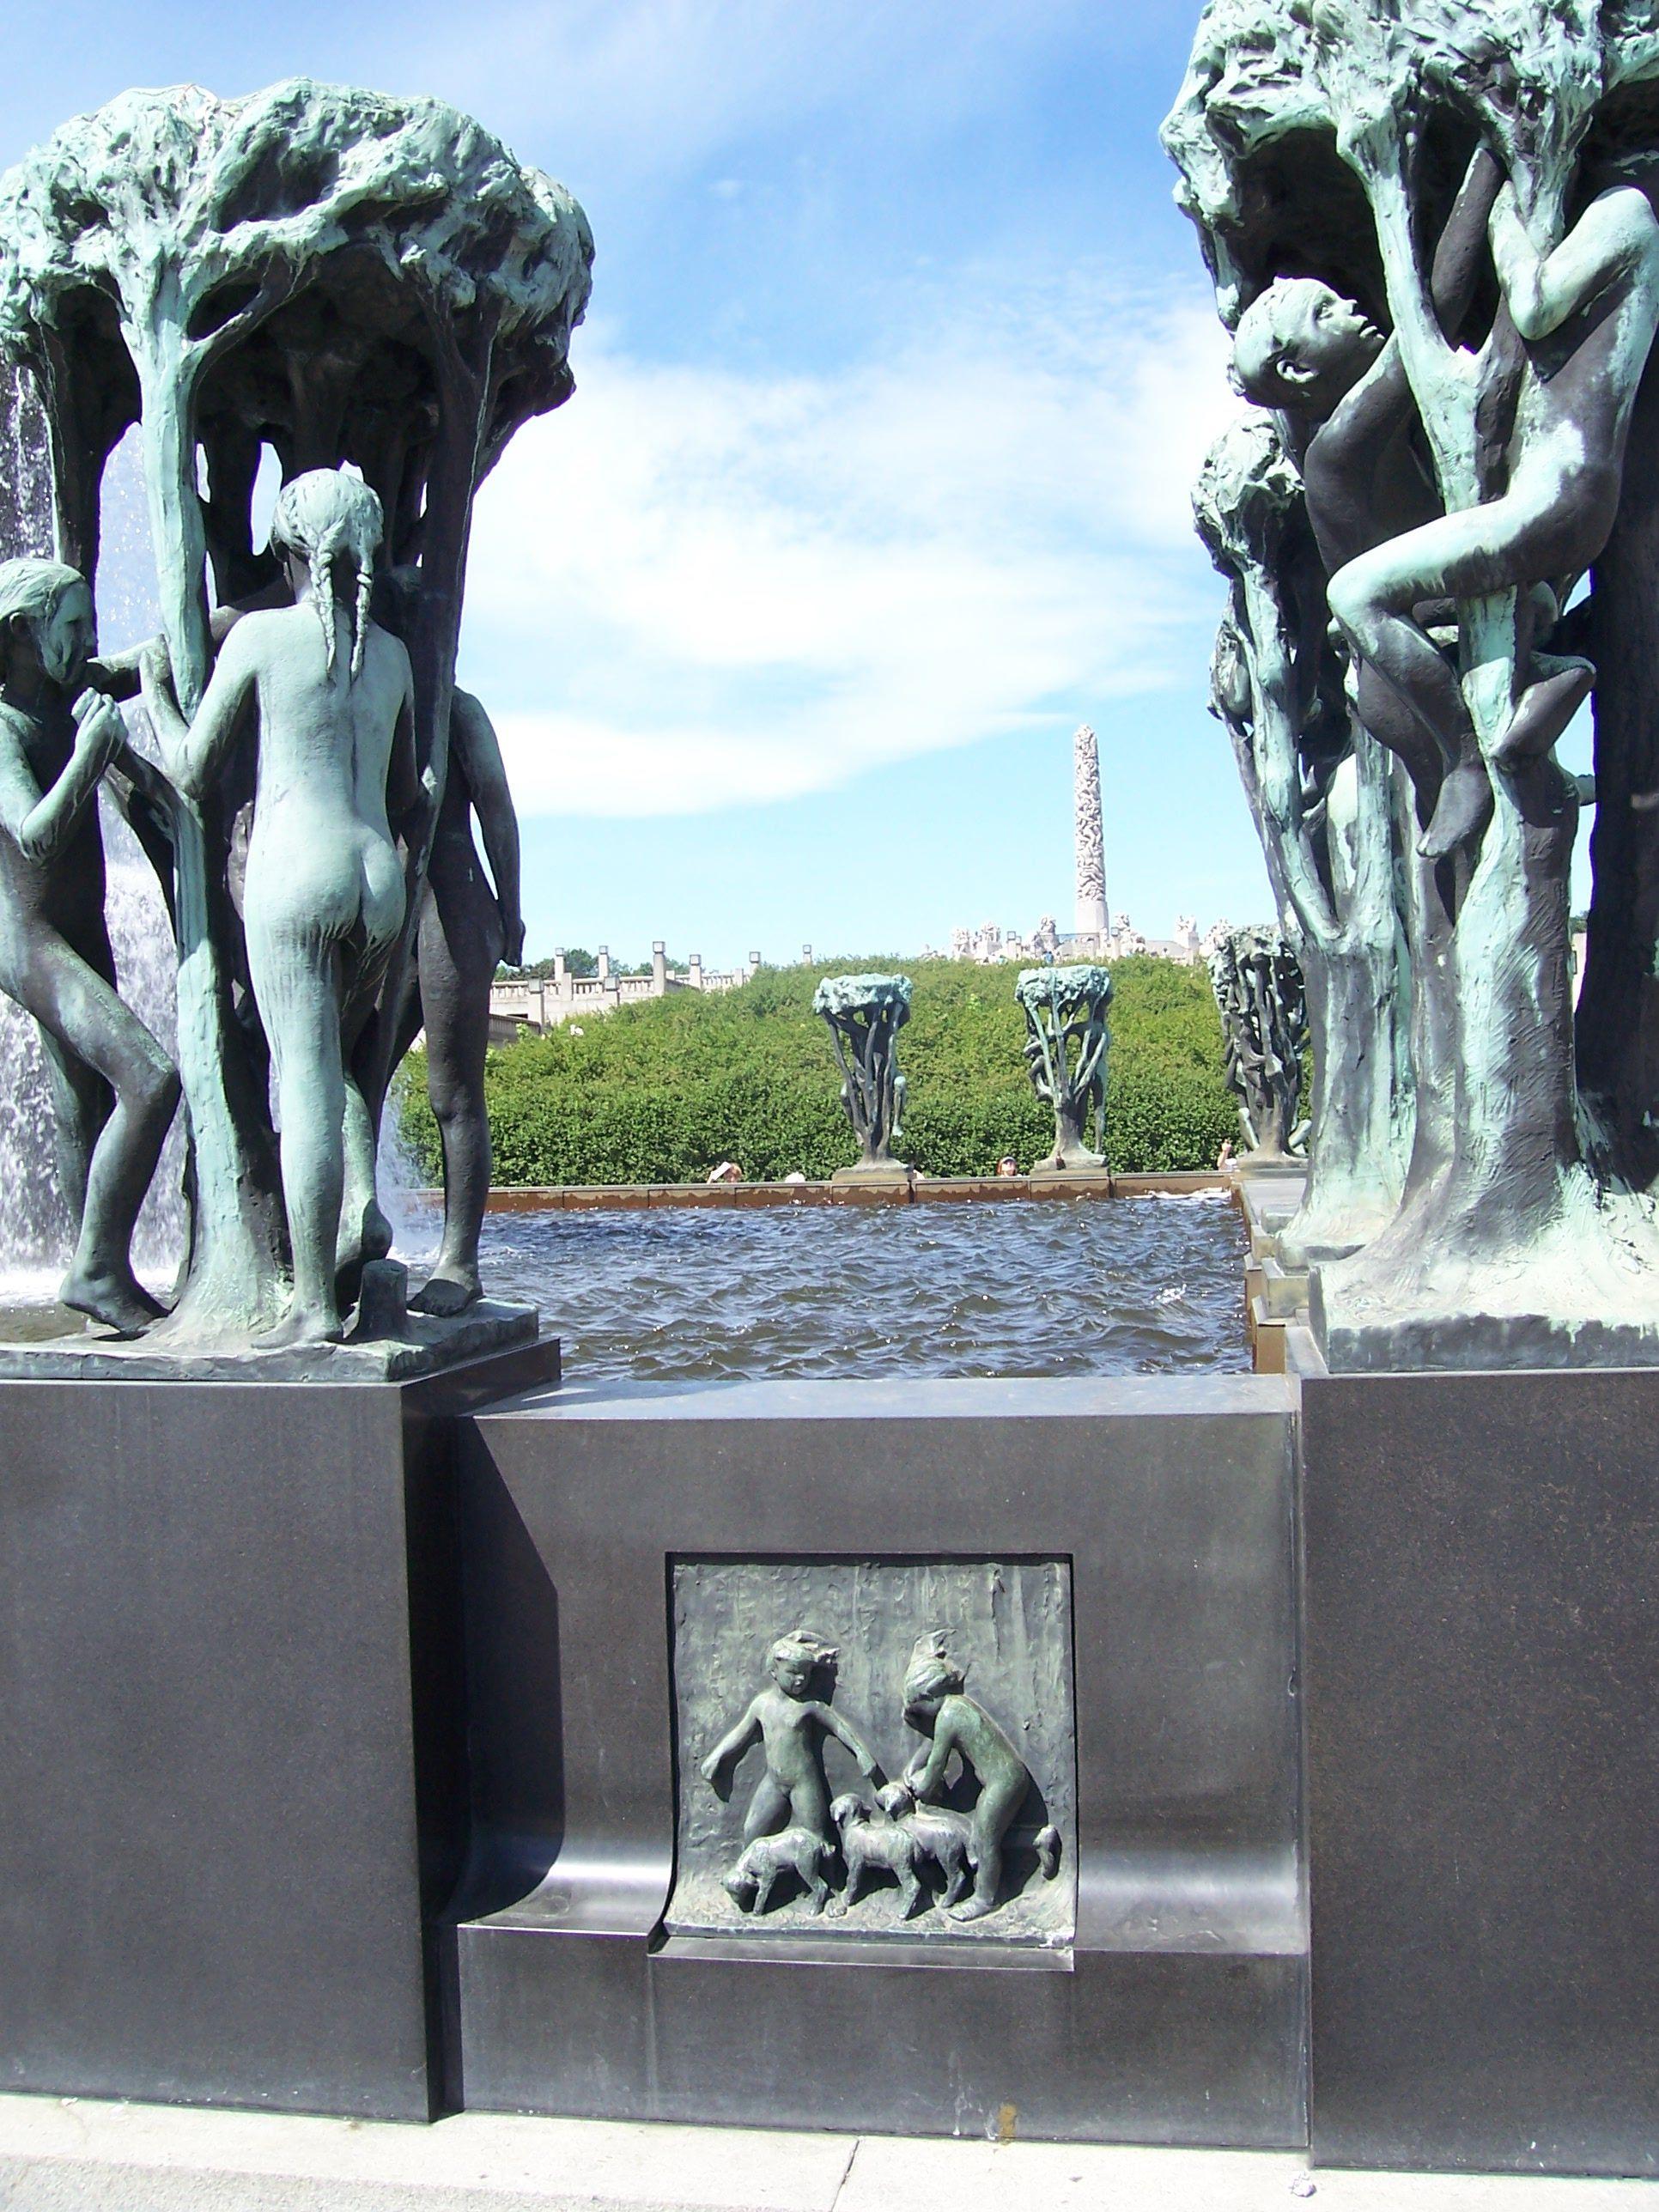 Vigelandsparken In Oslo Norway Holidays In Norway Norway Sculpture Park